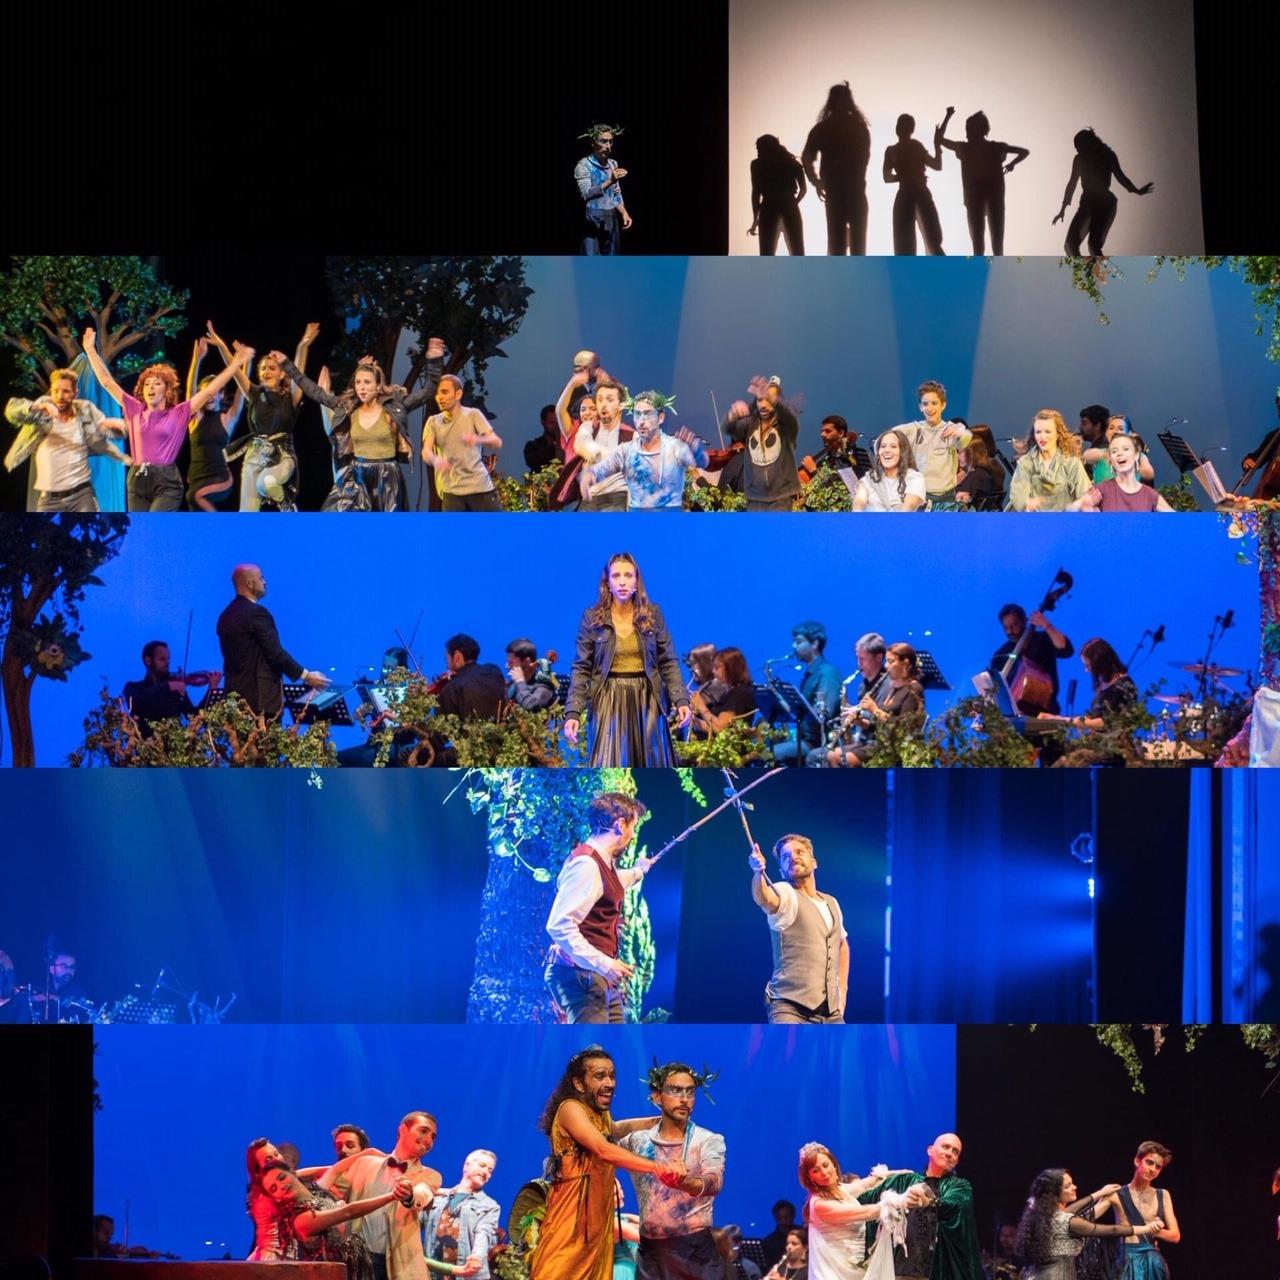 "<span  class=""uc_style_uc_tiles_grid_image_elementor_uc_items_attribute_title"" style=""color:#ffffff;"">Ana Paula Rocha - Teatro - Sonho de uma noite de Verão – Maio 2019 - 010</span>"